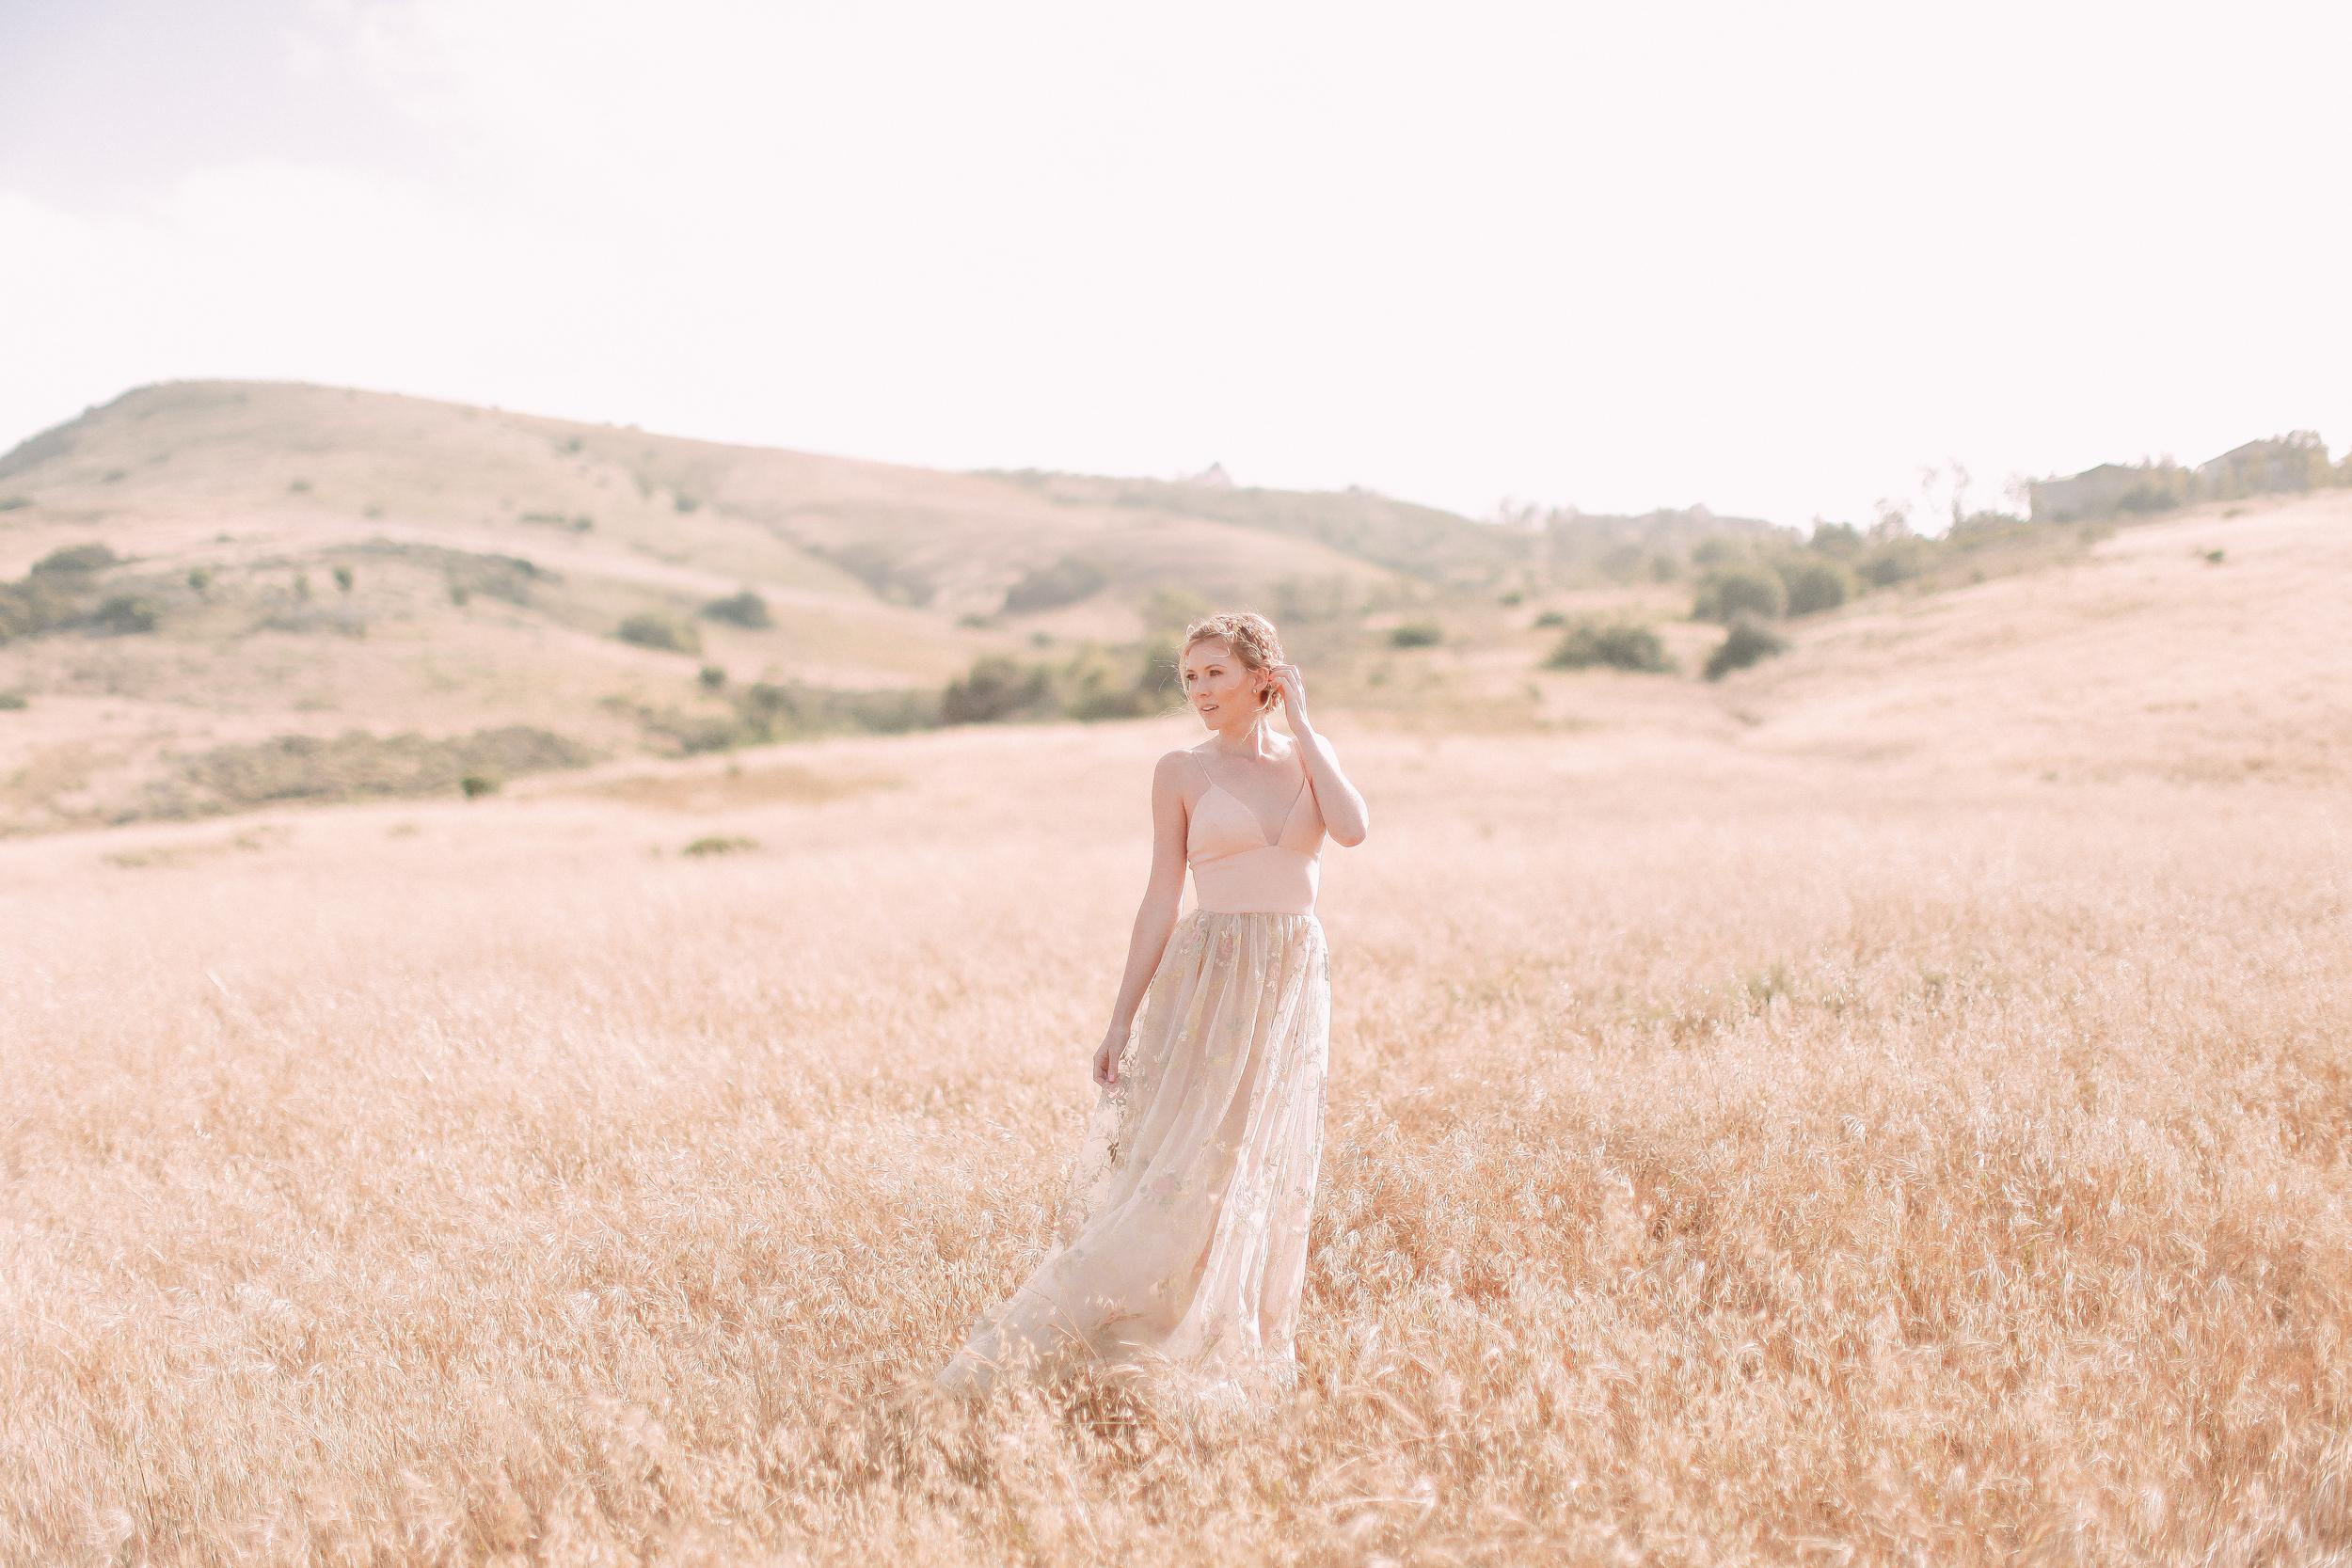 Cori Kleckner- Tara Healy Editorial Shoot1-27.JPG